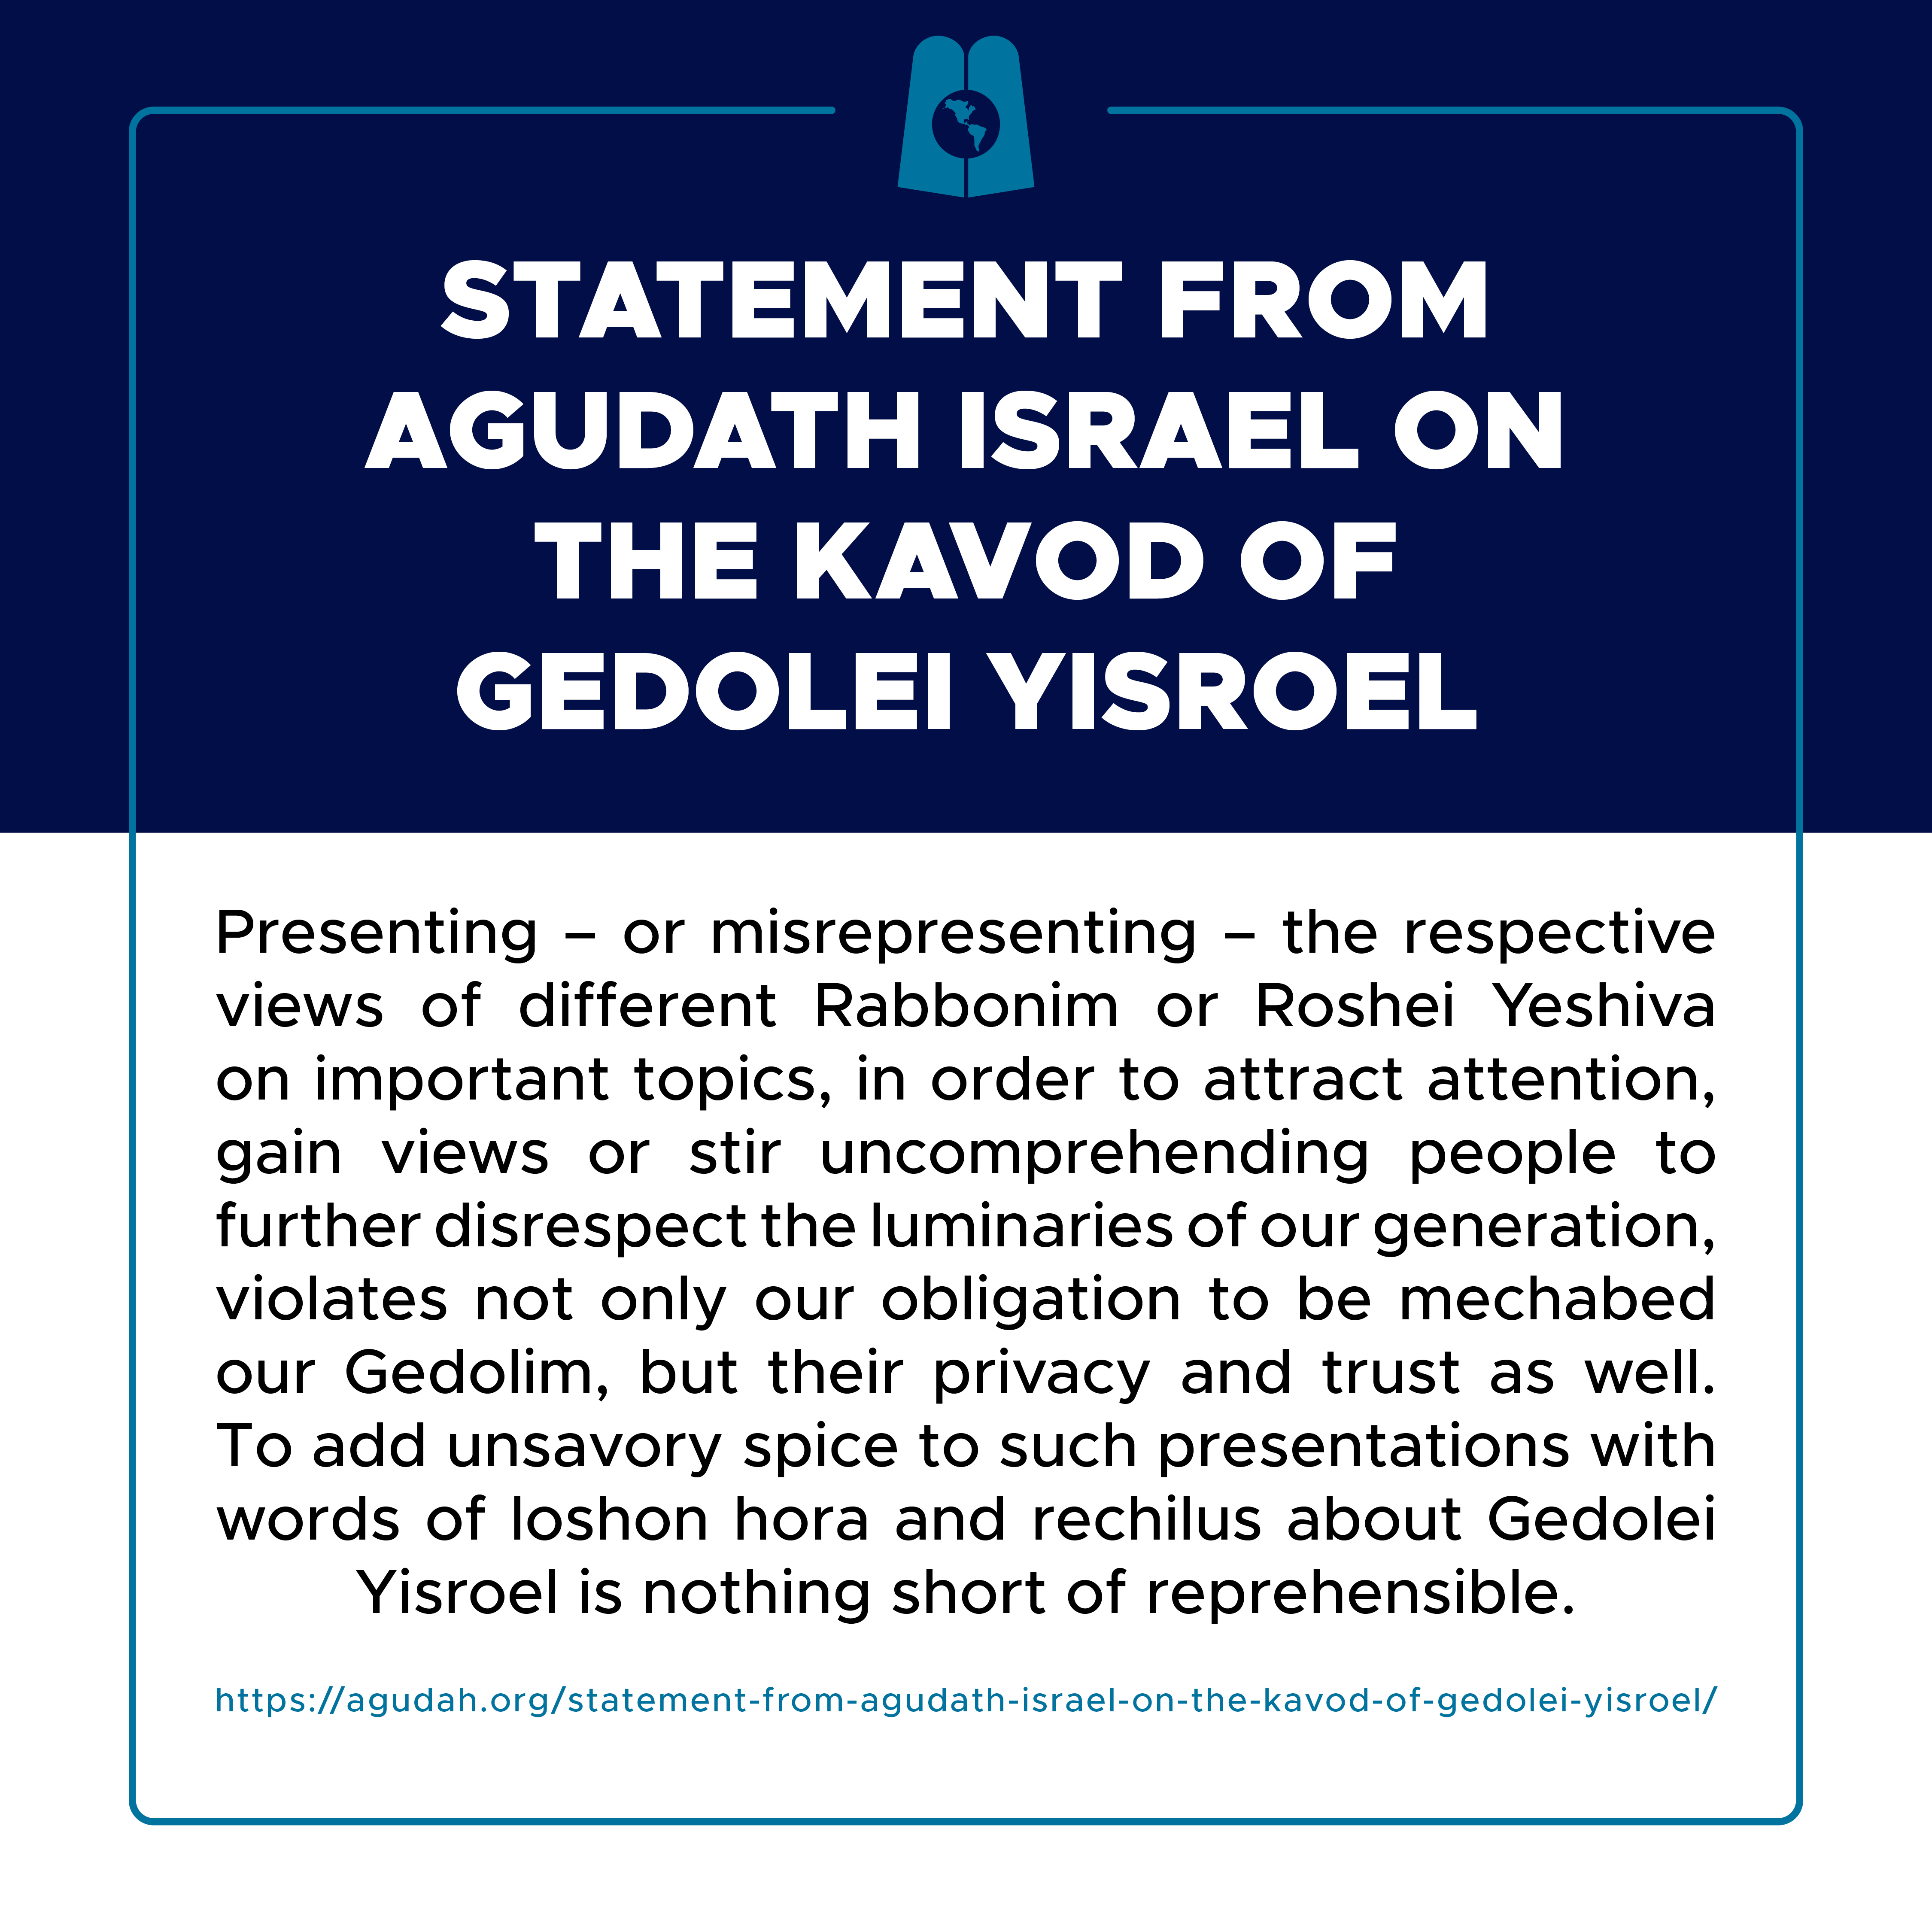 Statement from Agudath Israel on the Kavod of Gedolei Yisroel 1